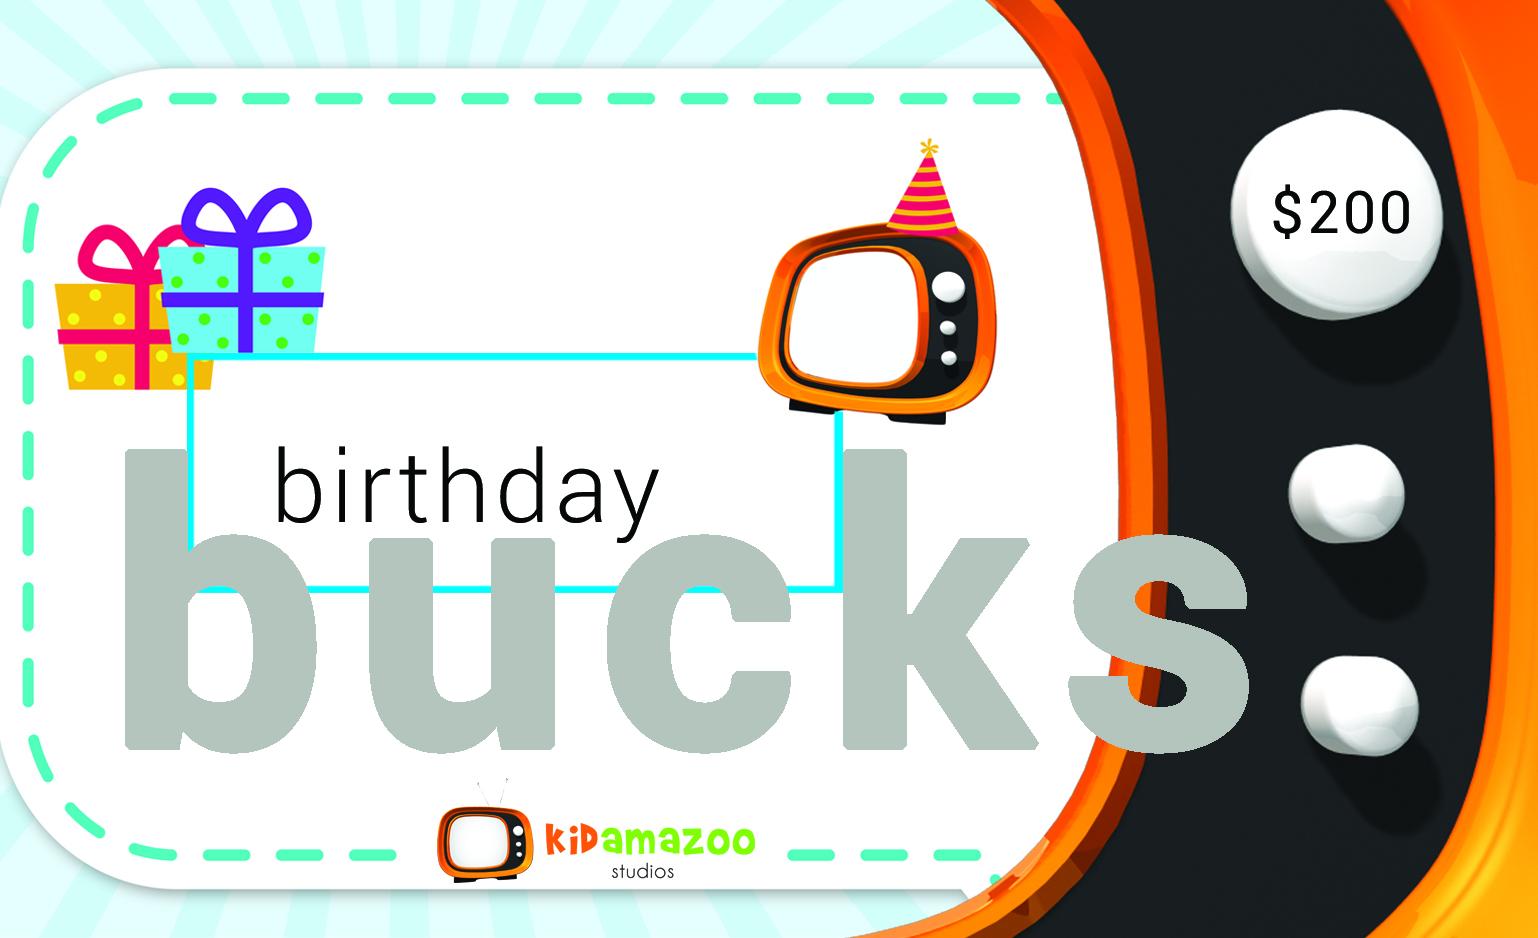 KidamazooStudios_BirthdayKit_BirthdayBucks_Front.jpg